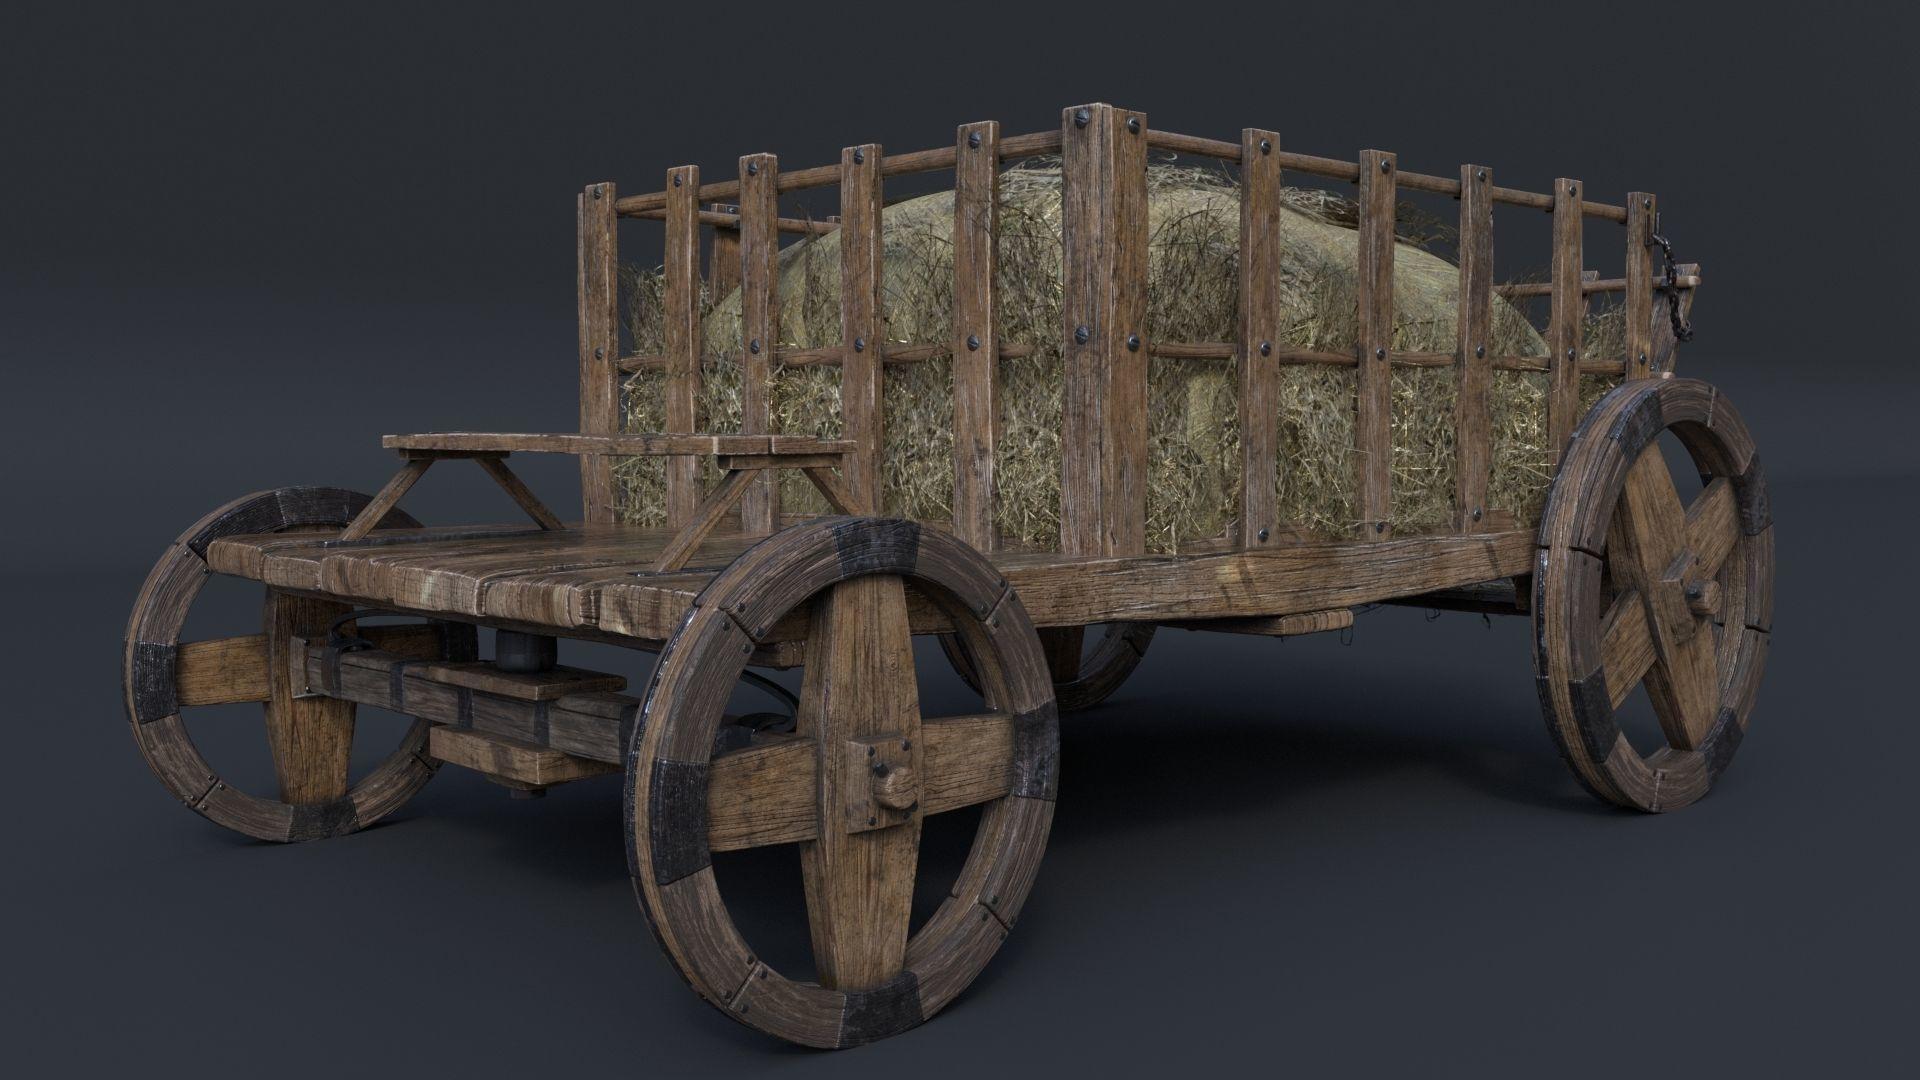 Antique Vintage Rustic Wooden Cart